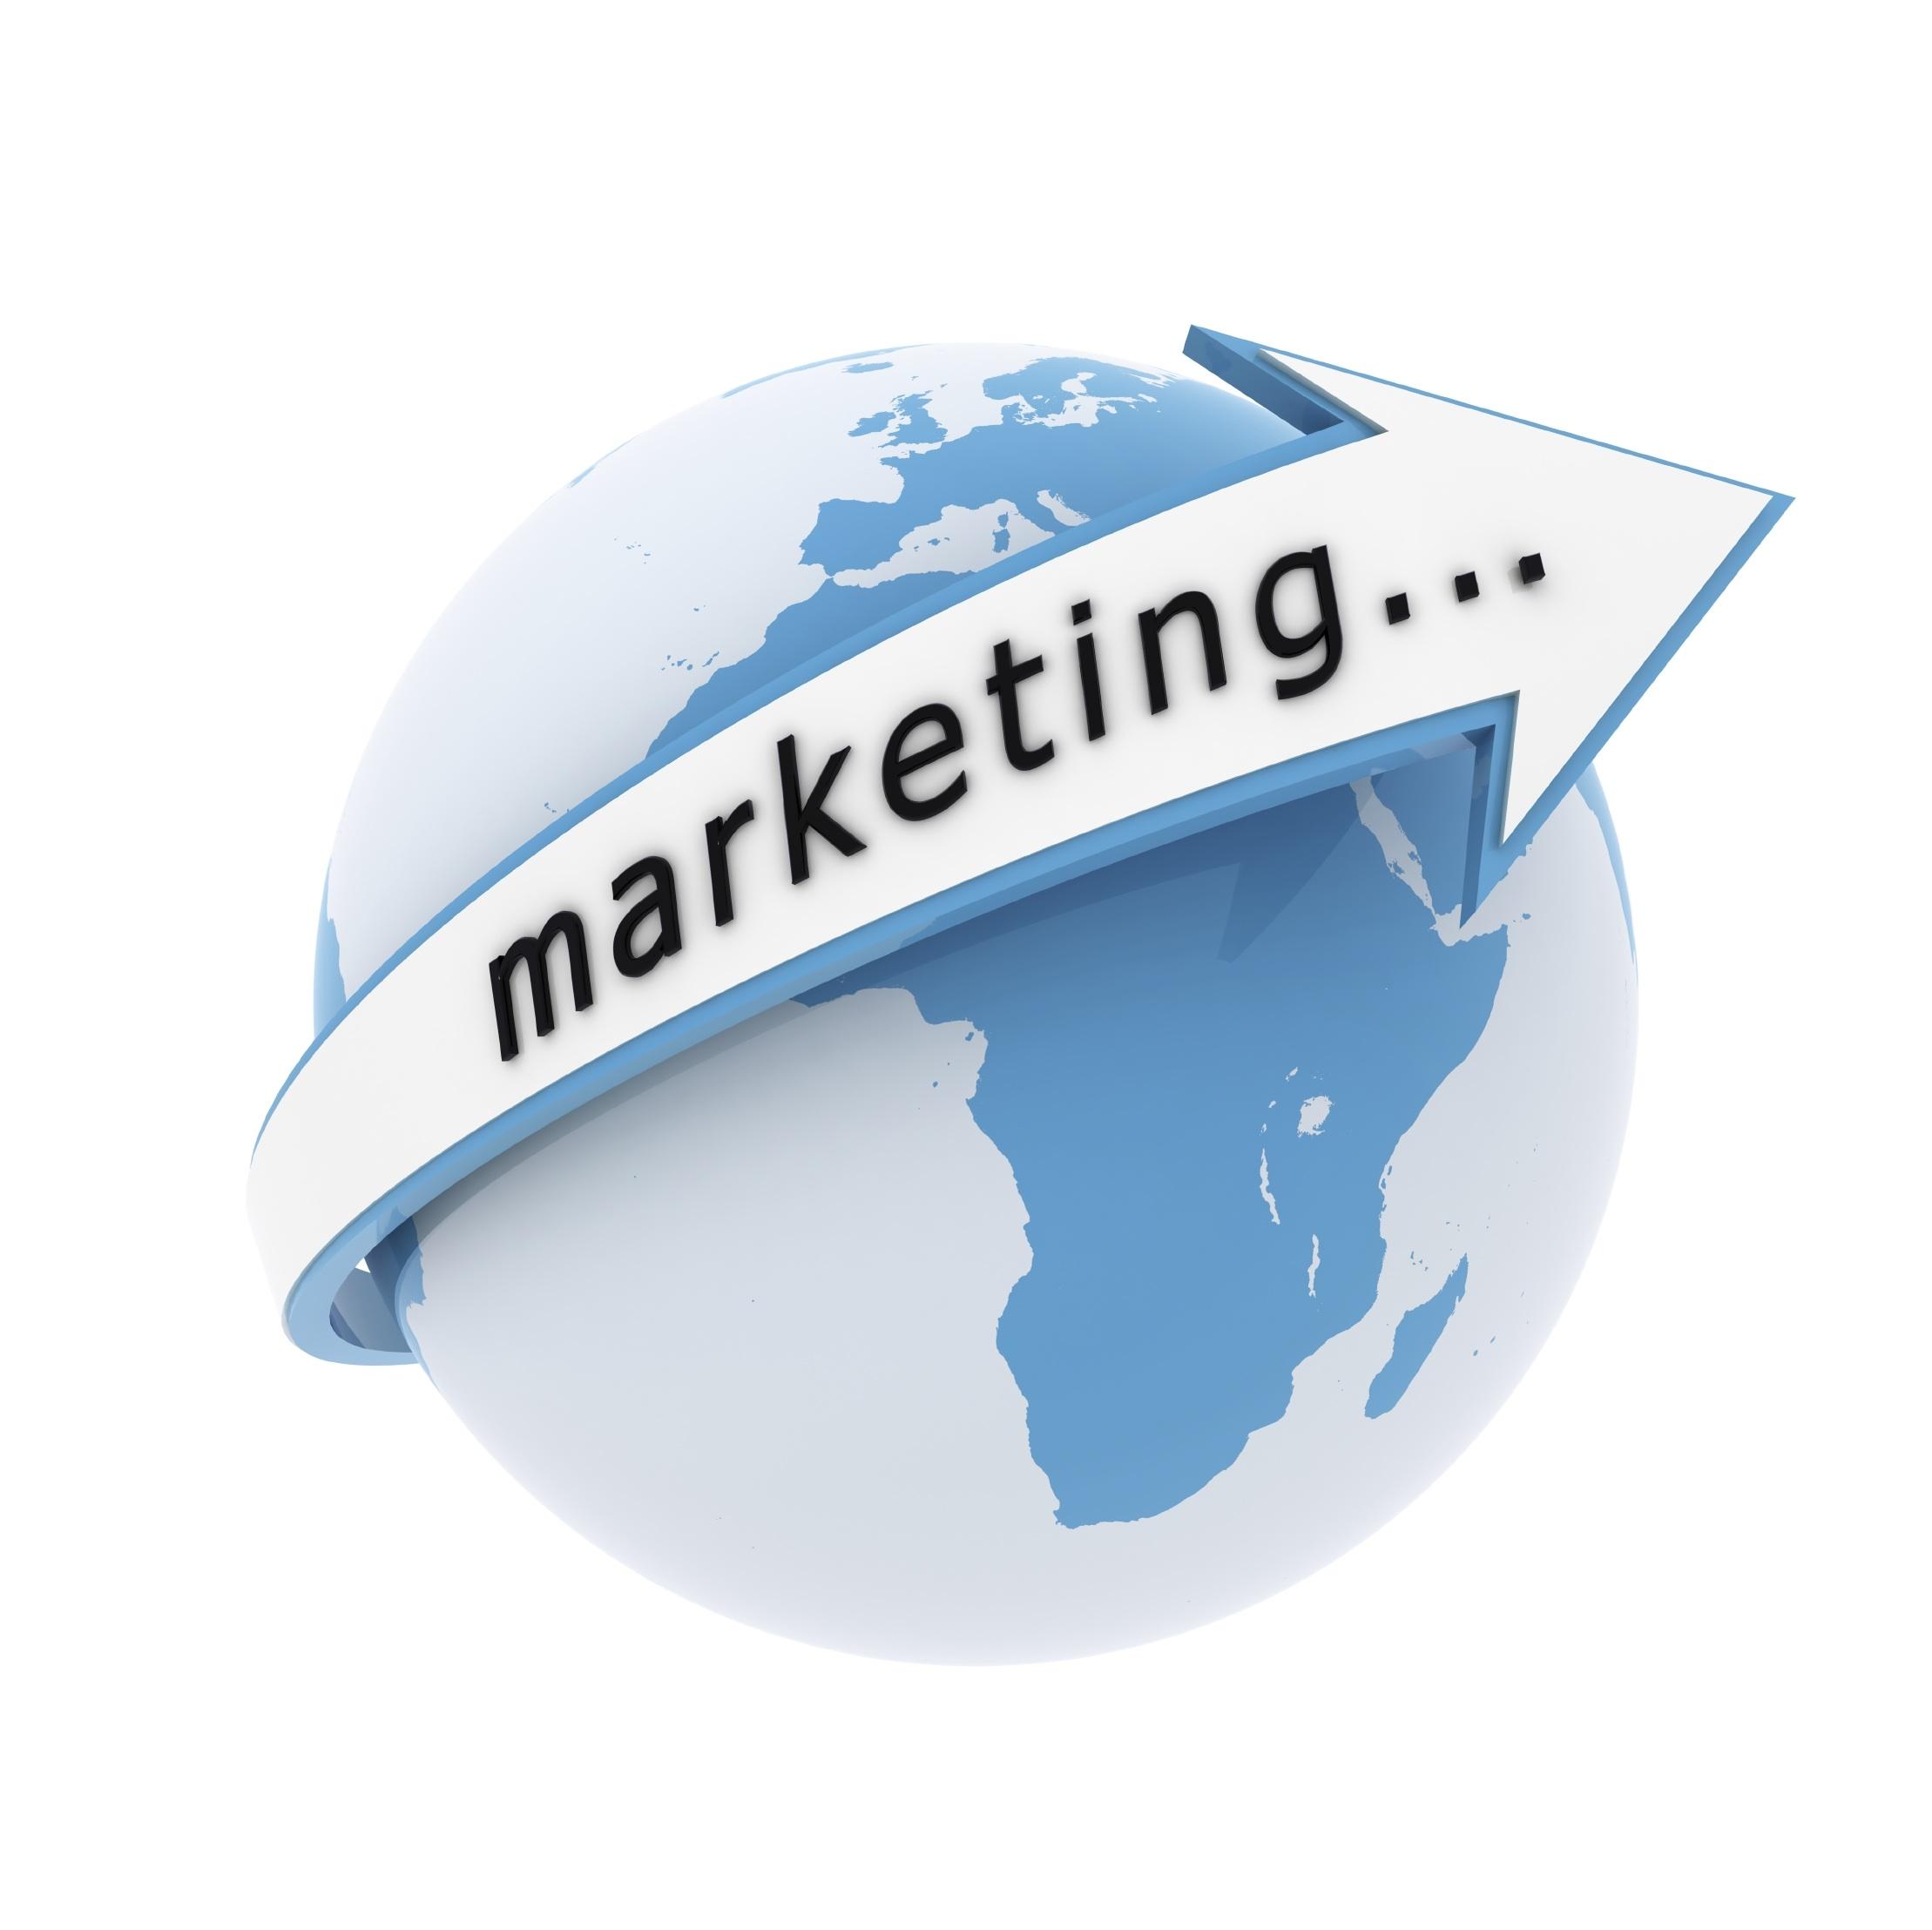 Marketing - Pan Atlantic